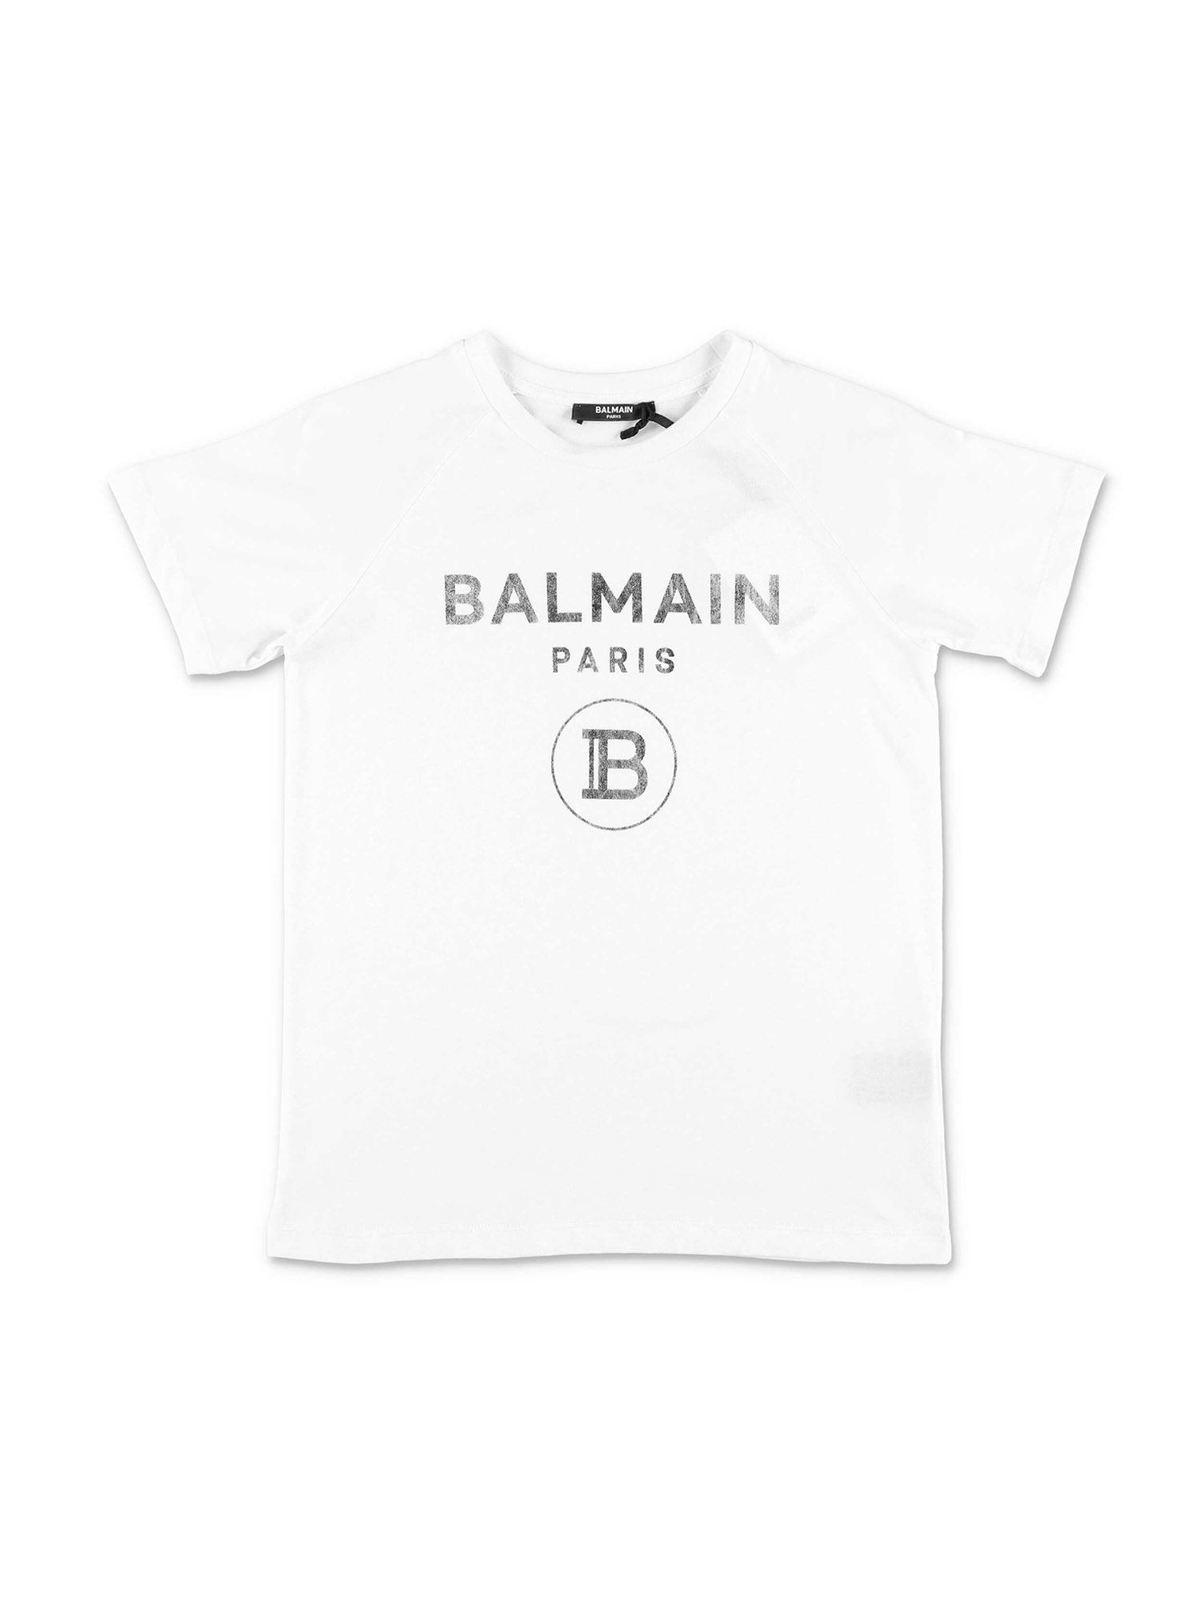 Balmain WHITE T-SHIRT WITH SILVER PRINT